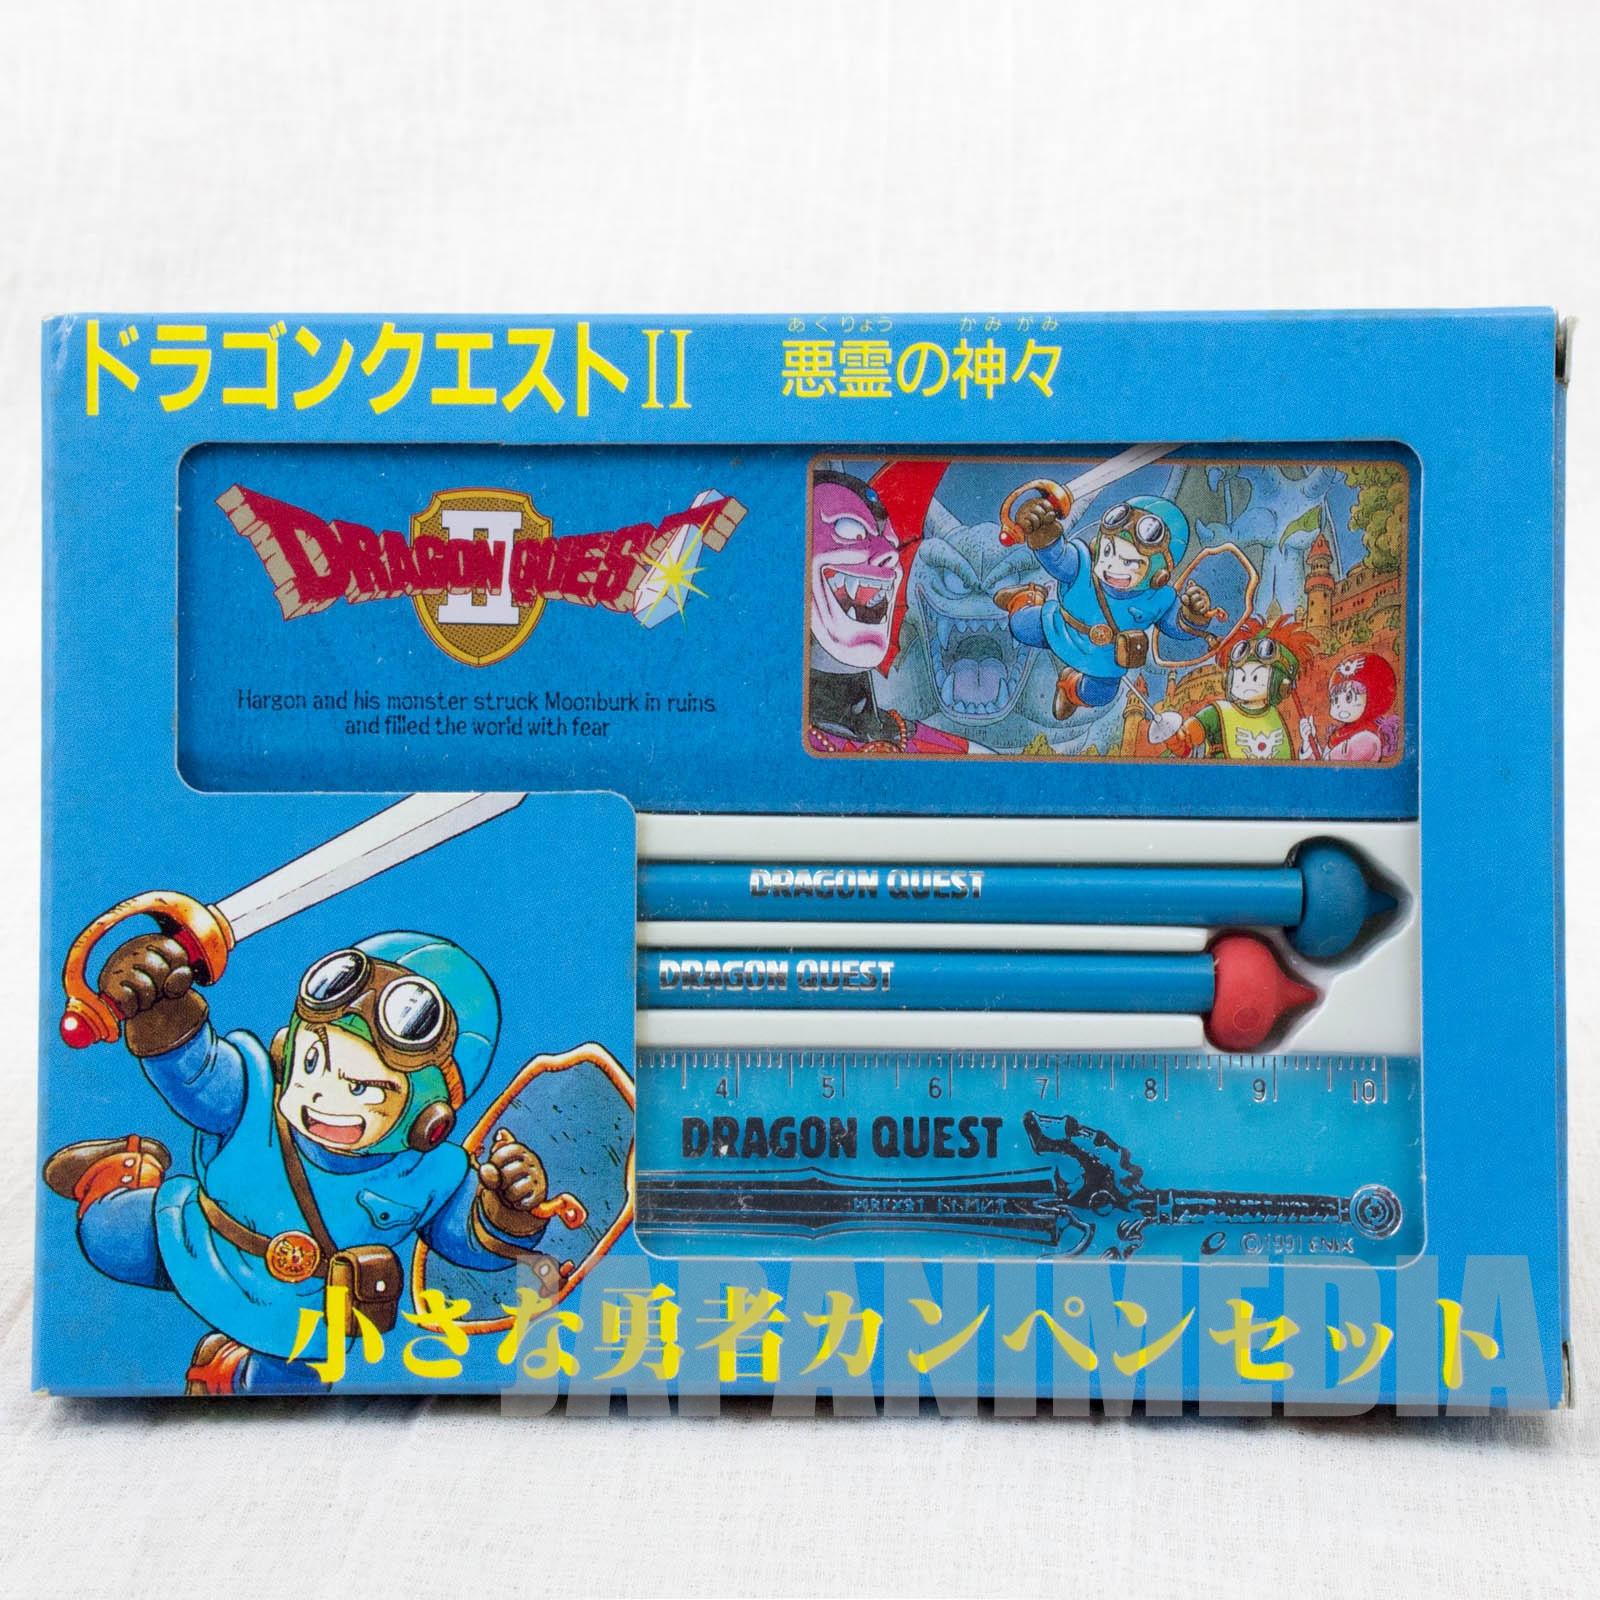 Dragon Quest 2 Mini Stationery set [Can pen case / Pencil / Ruler] ENIX JAPAN GAME